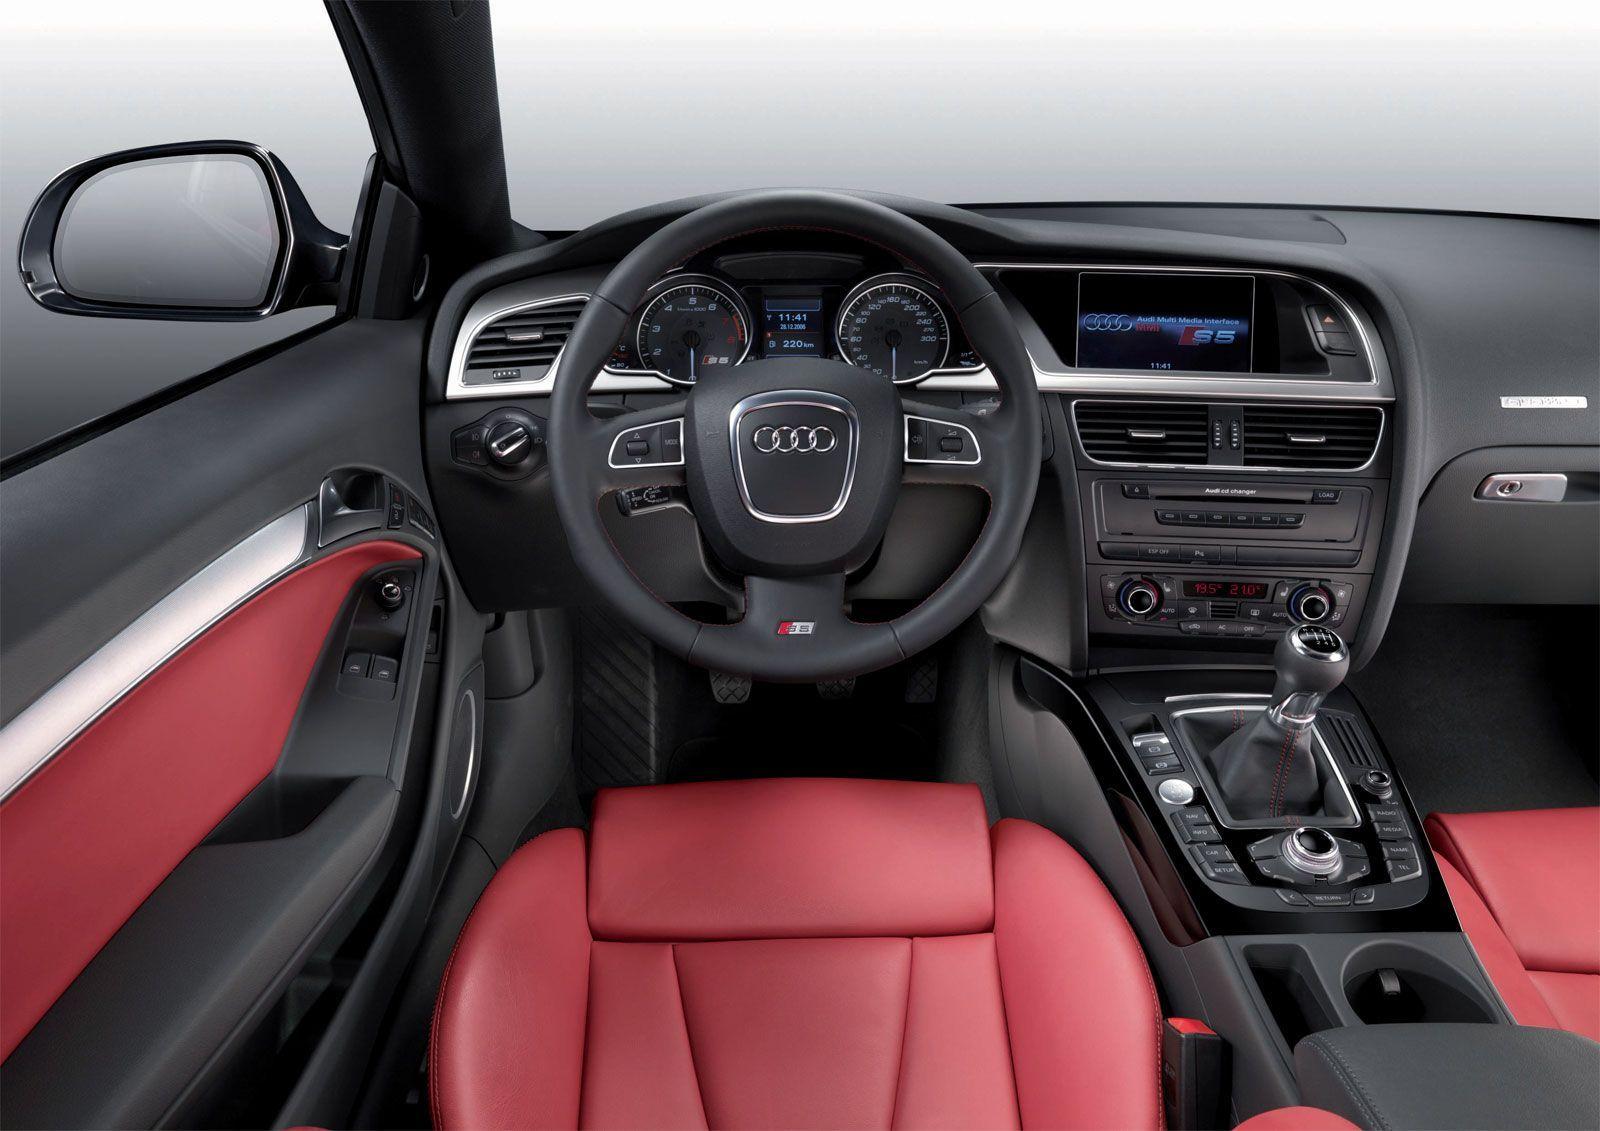 Audi r8 black interiortop 50 luxury car interior designs uzntse8x jpg 1 600 1 131 pixels car styles pinterest audi s5 audi and cars